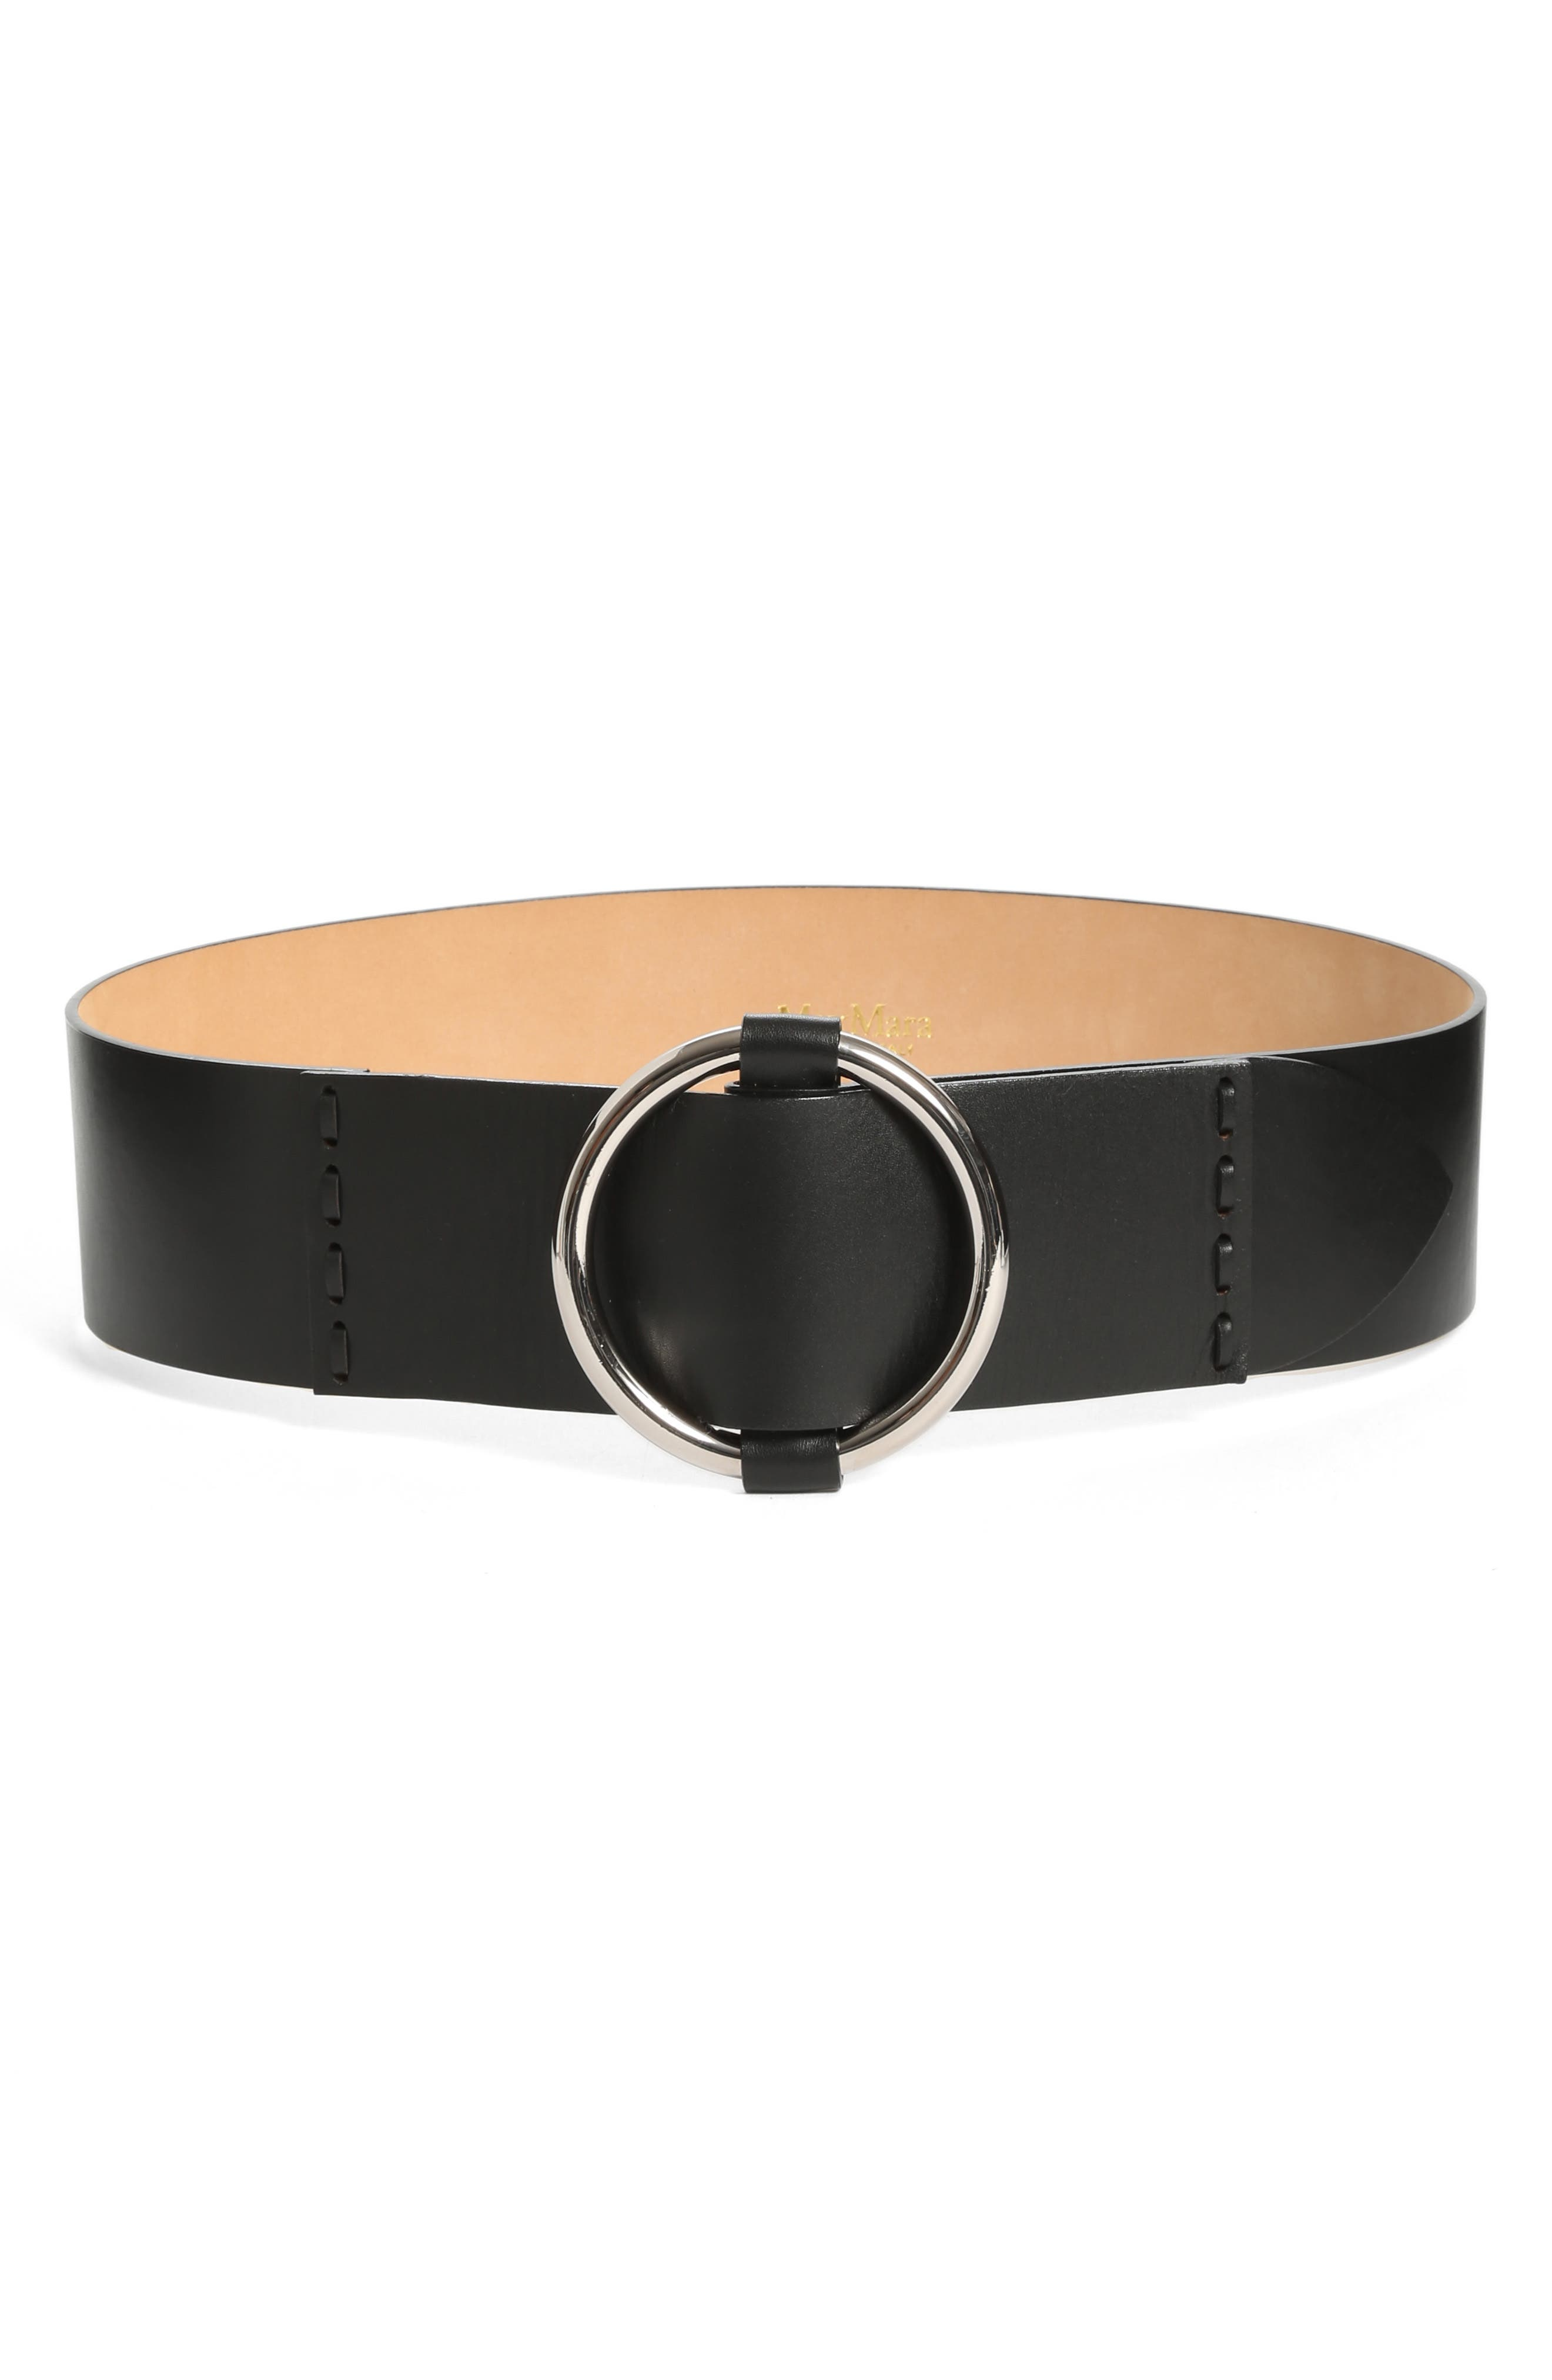 MAX MARA, Curt Circle Buckle Leather Belt, Main thumbnail 1, color, 001